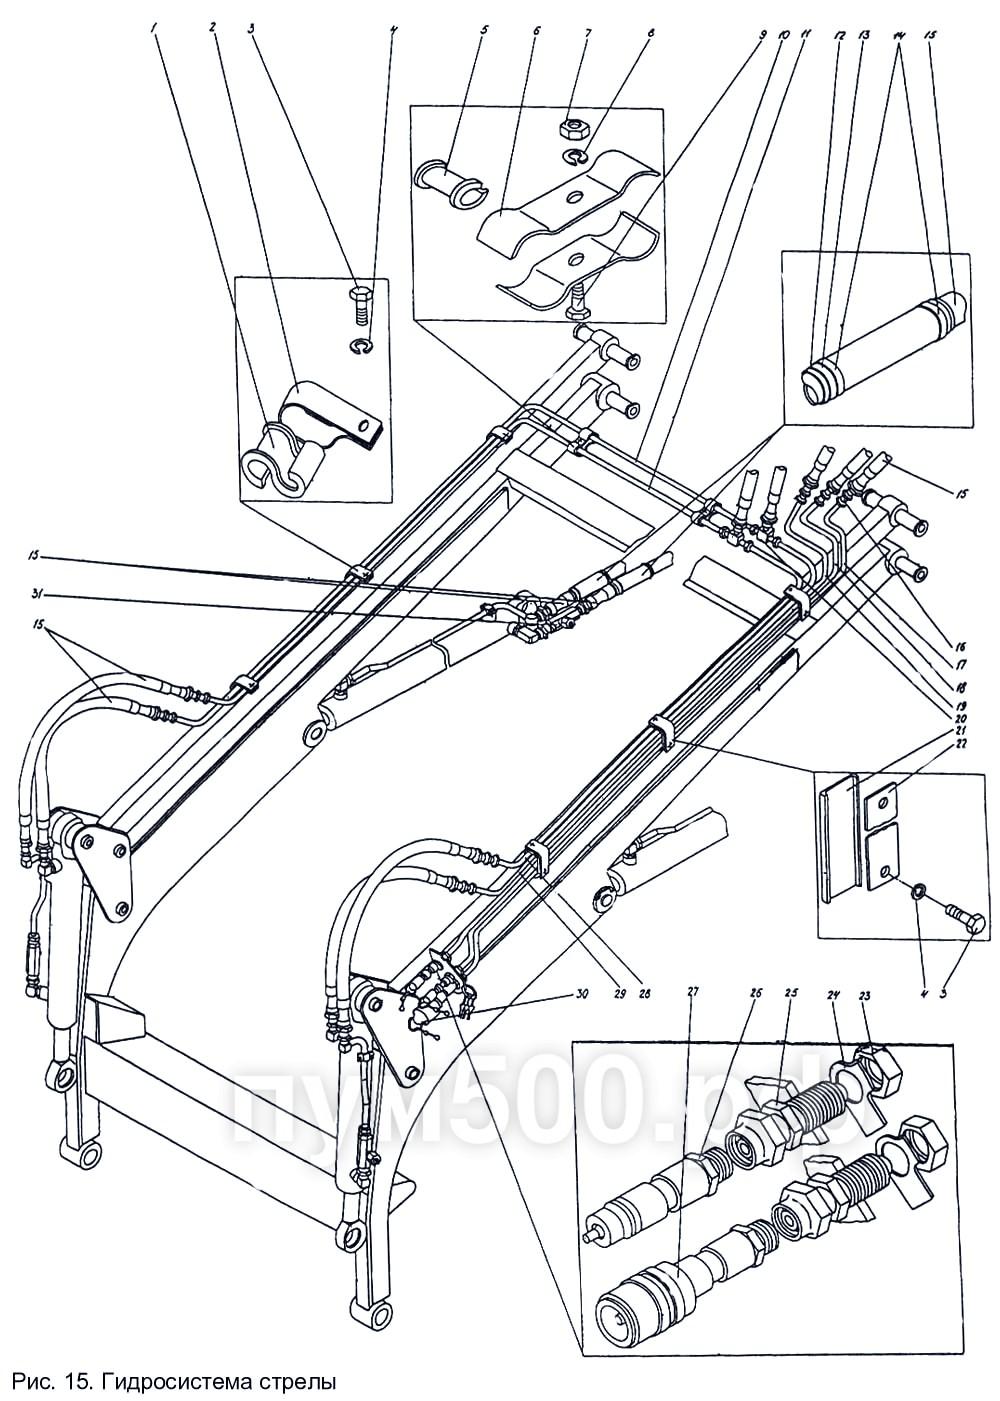 ПУМ-500 - Гидросистема стрелы П1.10.05сб-1